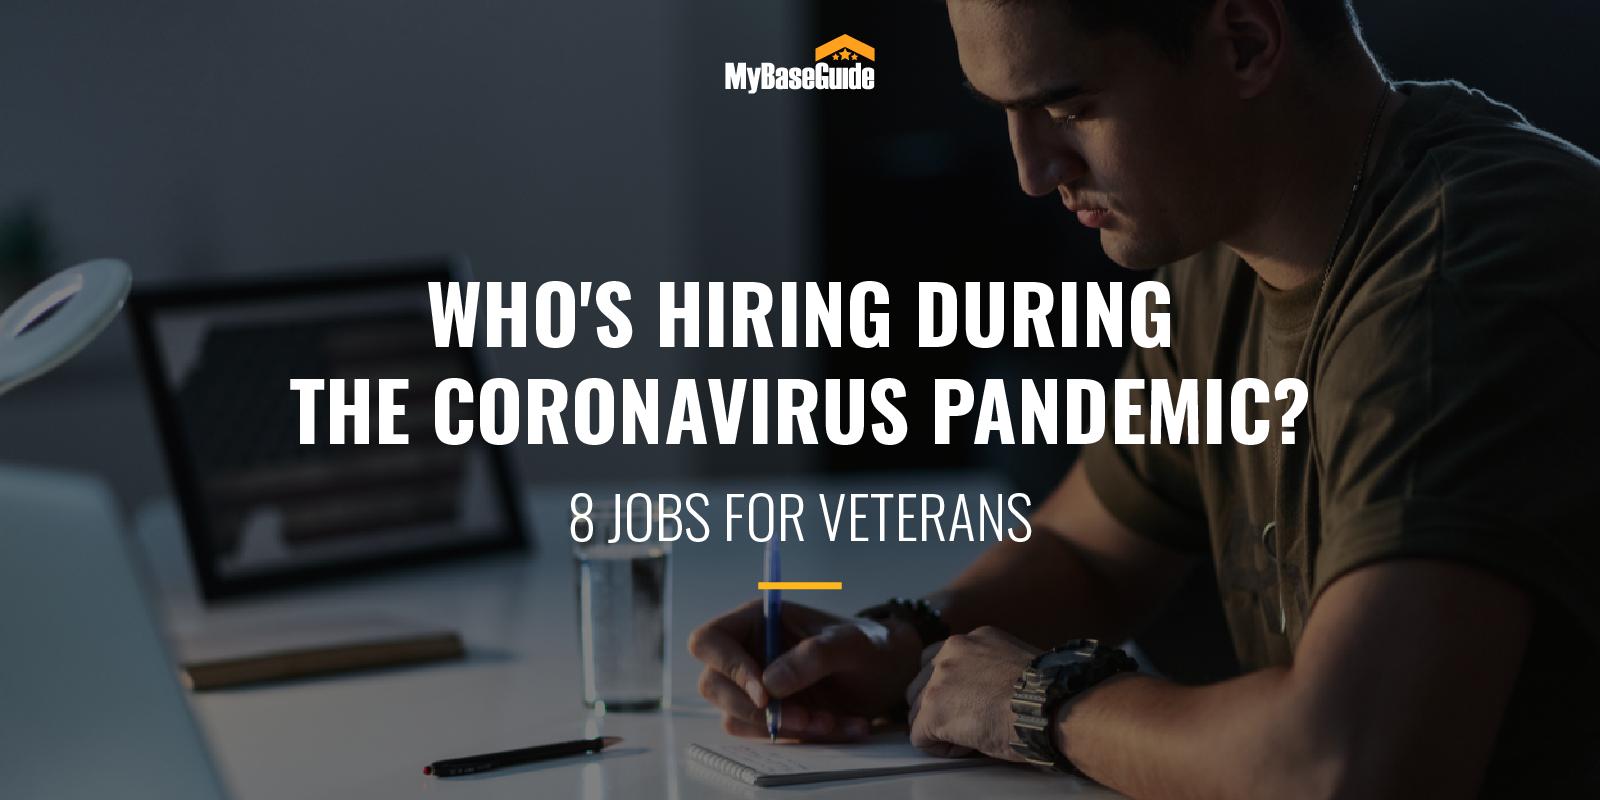 Who's Hiring During the Coronavirus Pandemic? 8 Jobs for Veterans